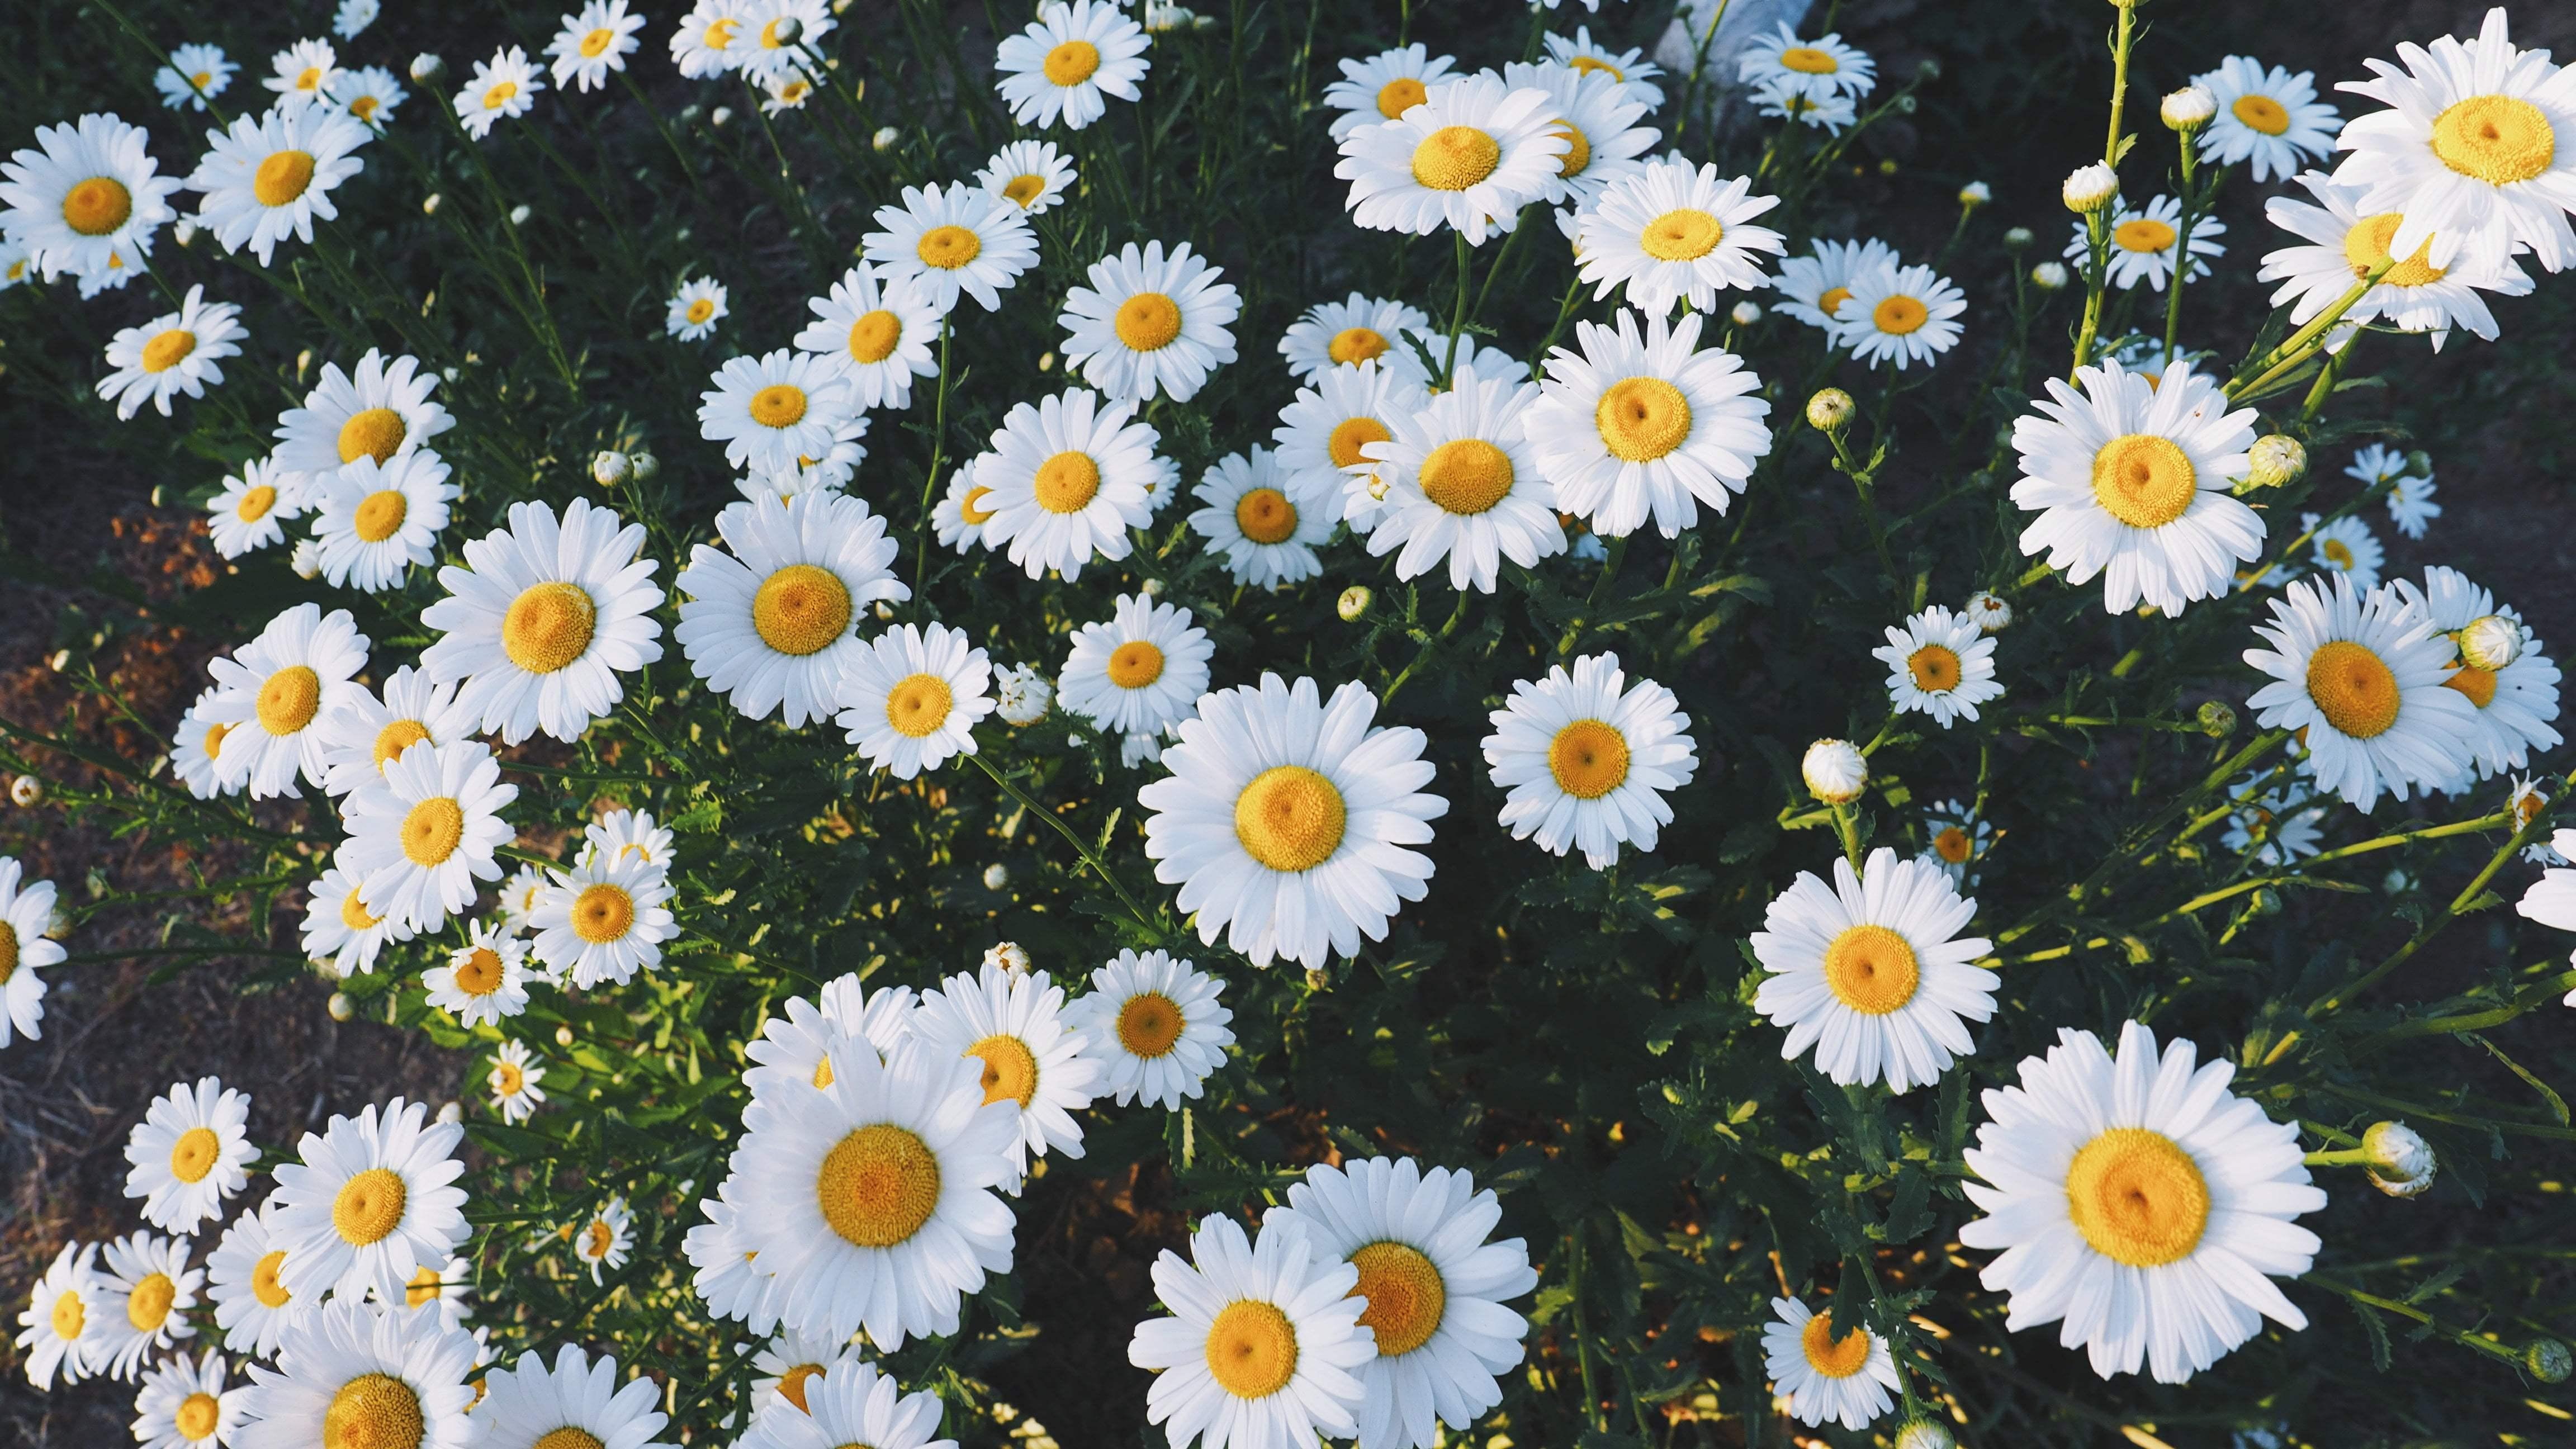 Aesthetic Flower Laptop Wallpapers Top Free Aesthetic Flower Laptop Backgrounds Wallpaperaccess